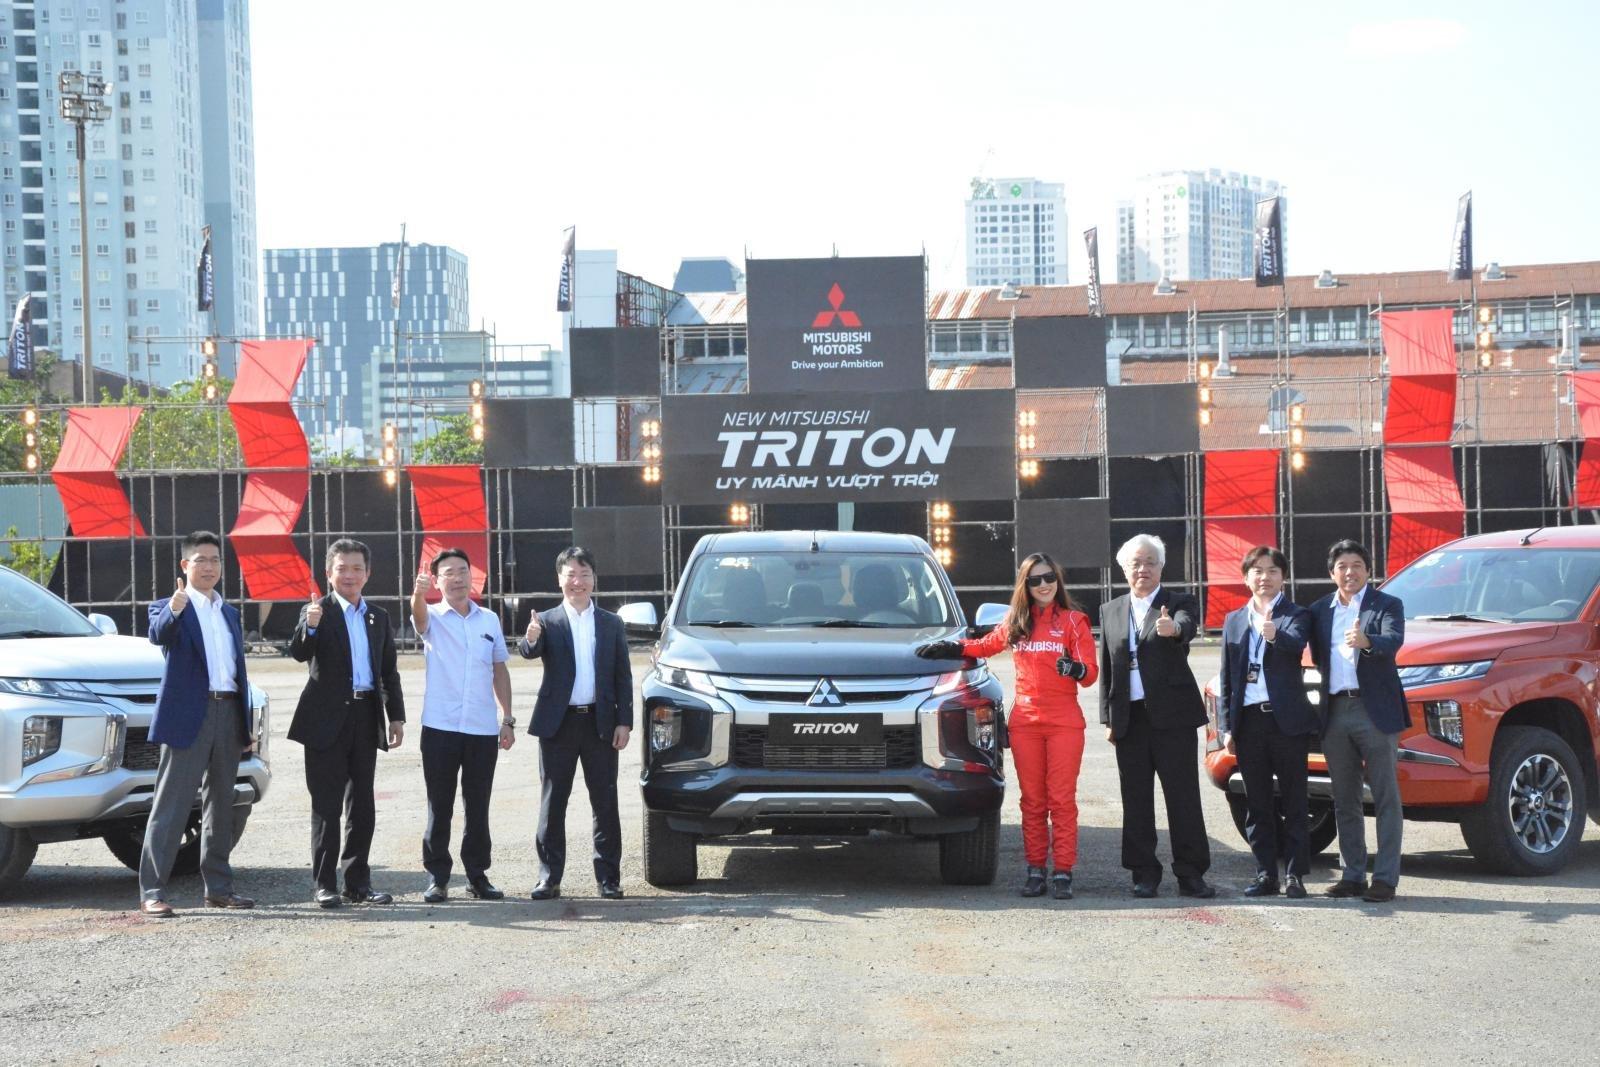 Ảnh chụp đầu xe Mitsubishi Triton 2019